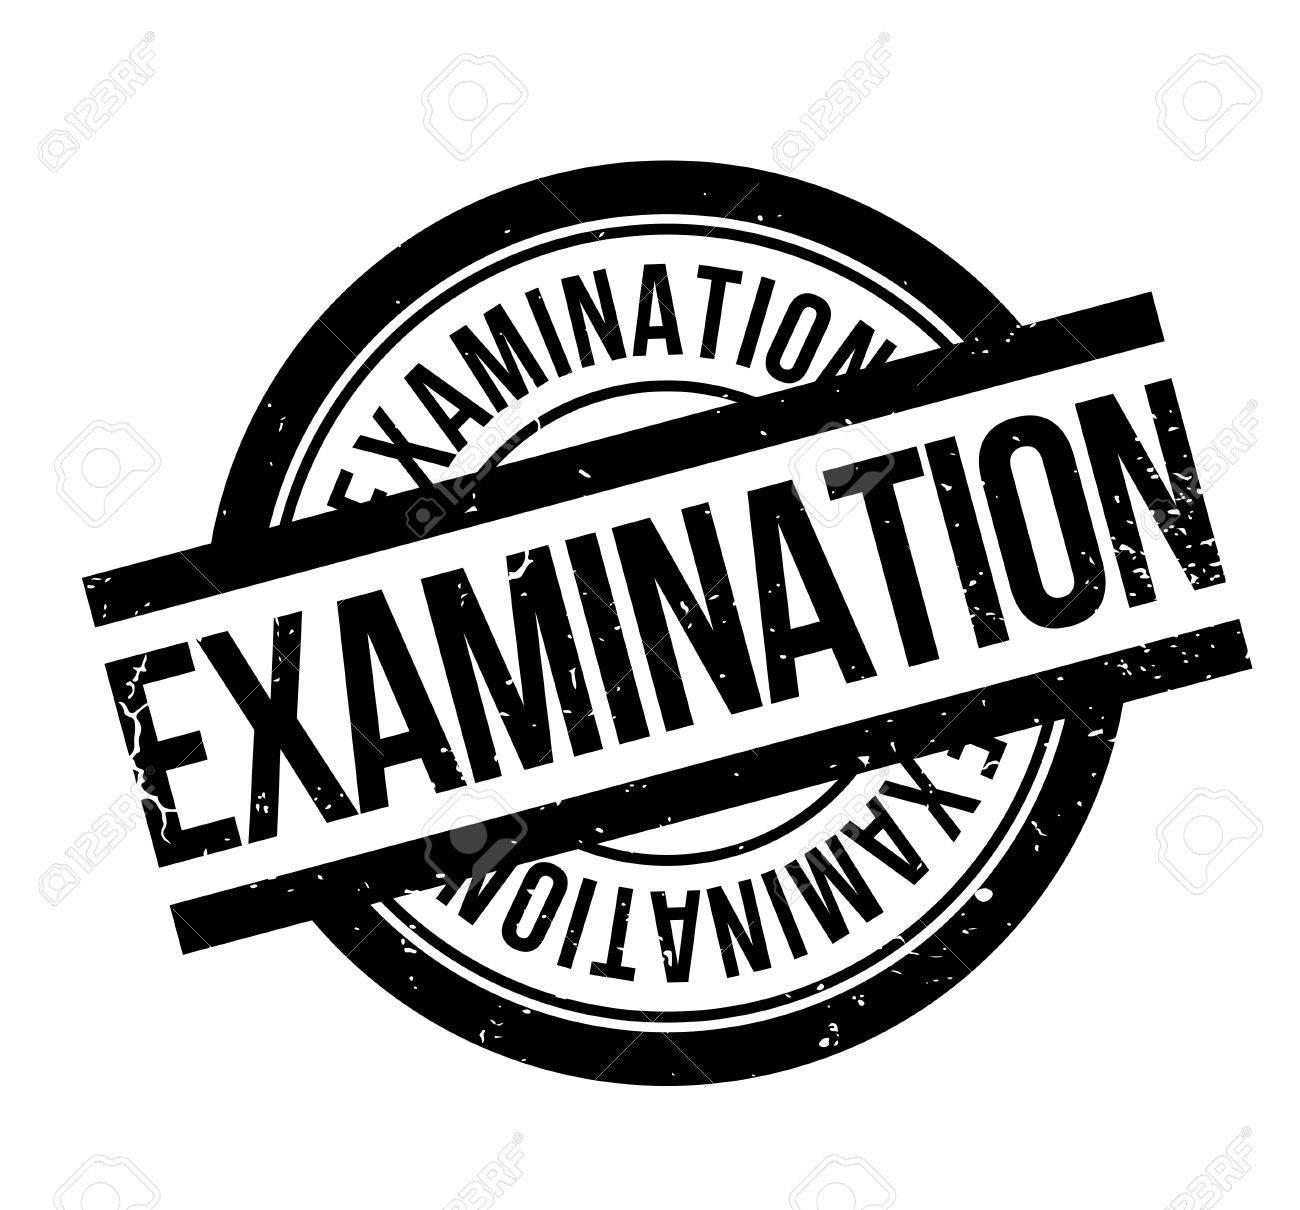 Examination rubber stamp - 82549989